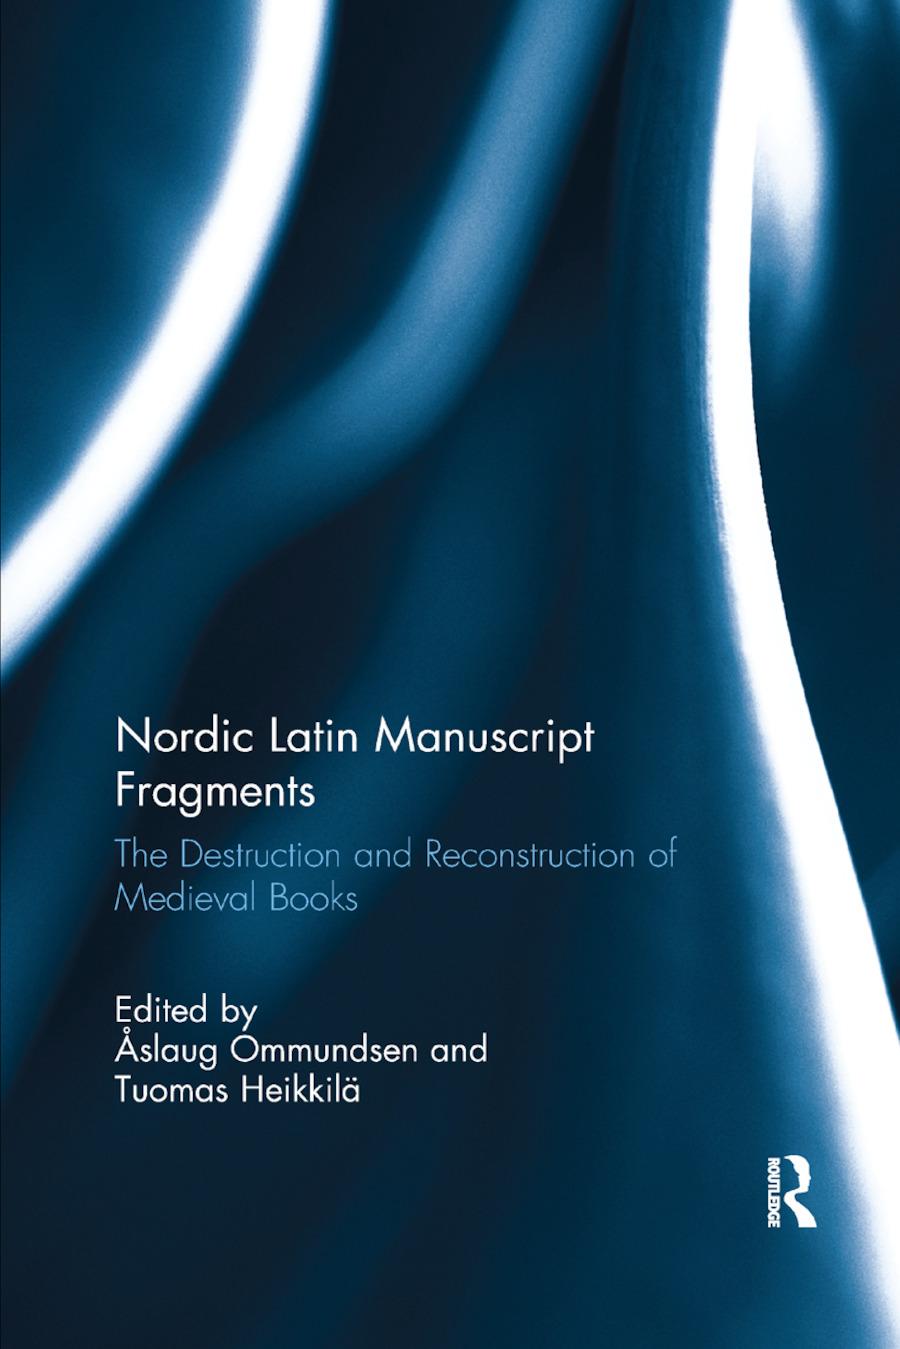 Nordic Latin Manuscript Fragments